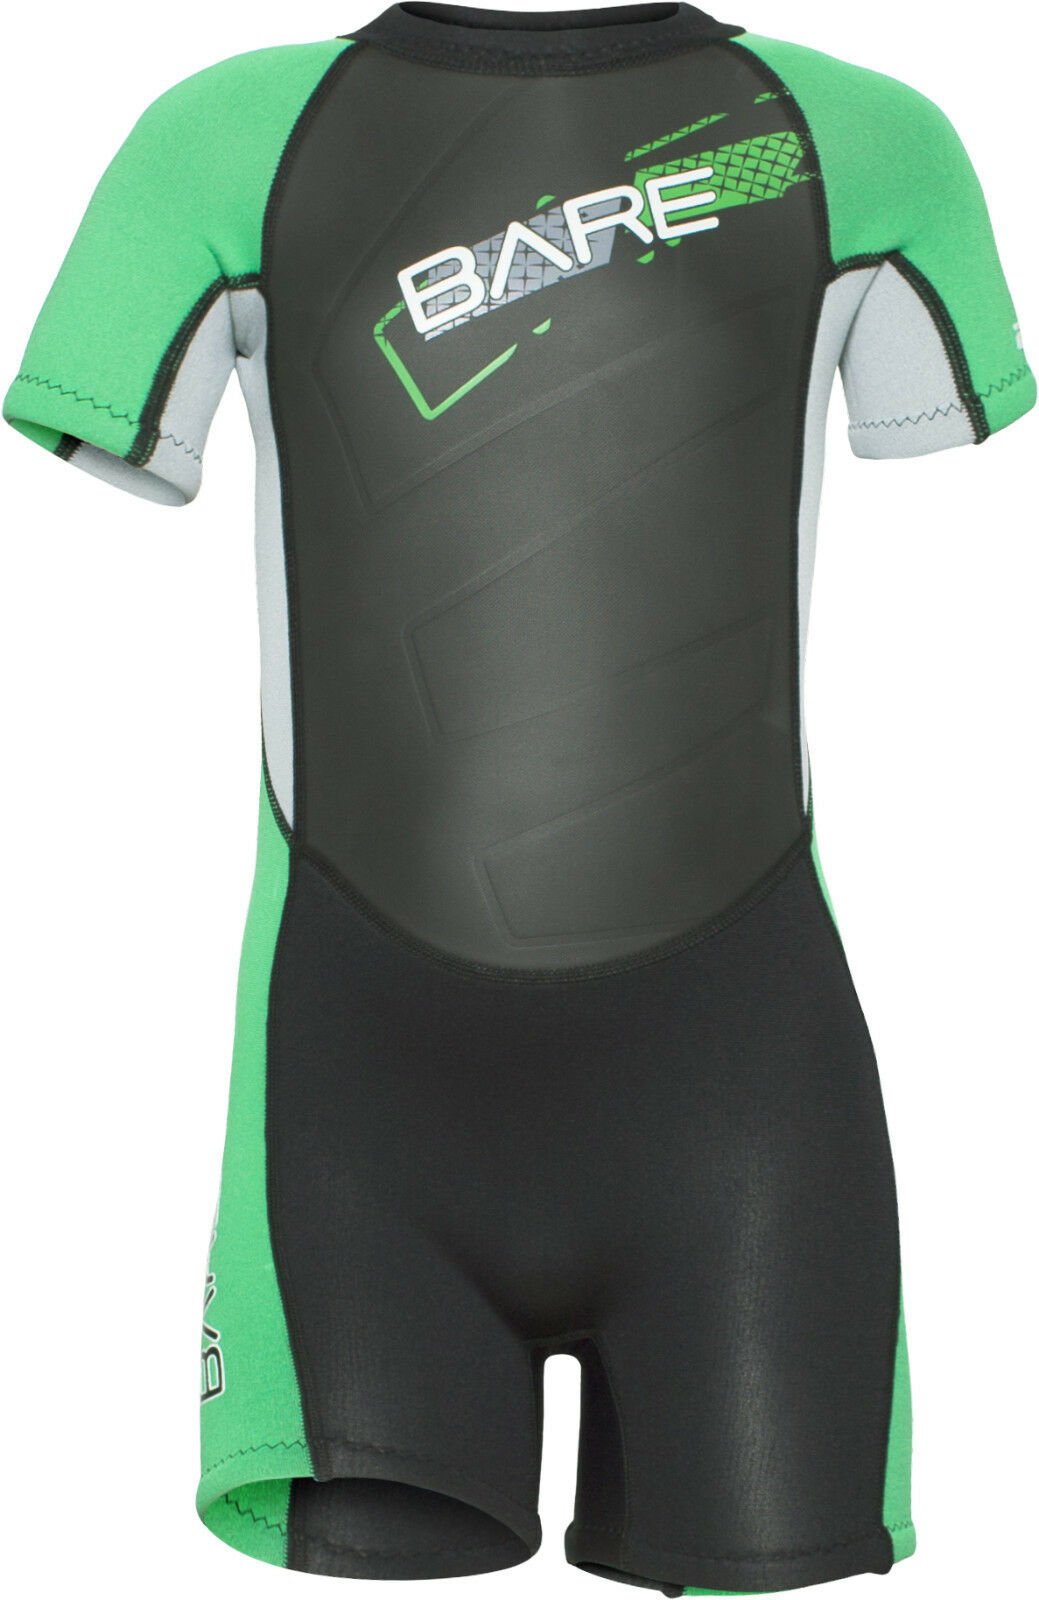 Bare Kids Tadpole WetSuit Shorty Sun Guard Swim Green  All Size 2,4,6yr  comfortable